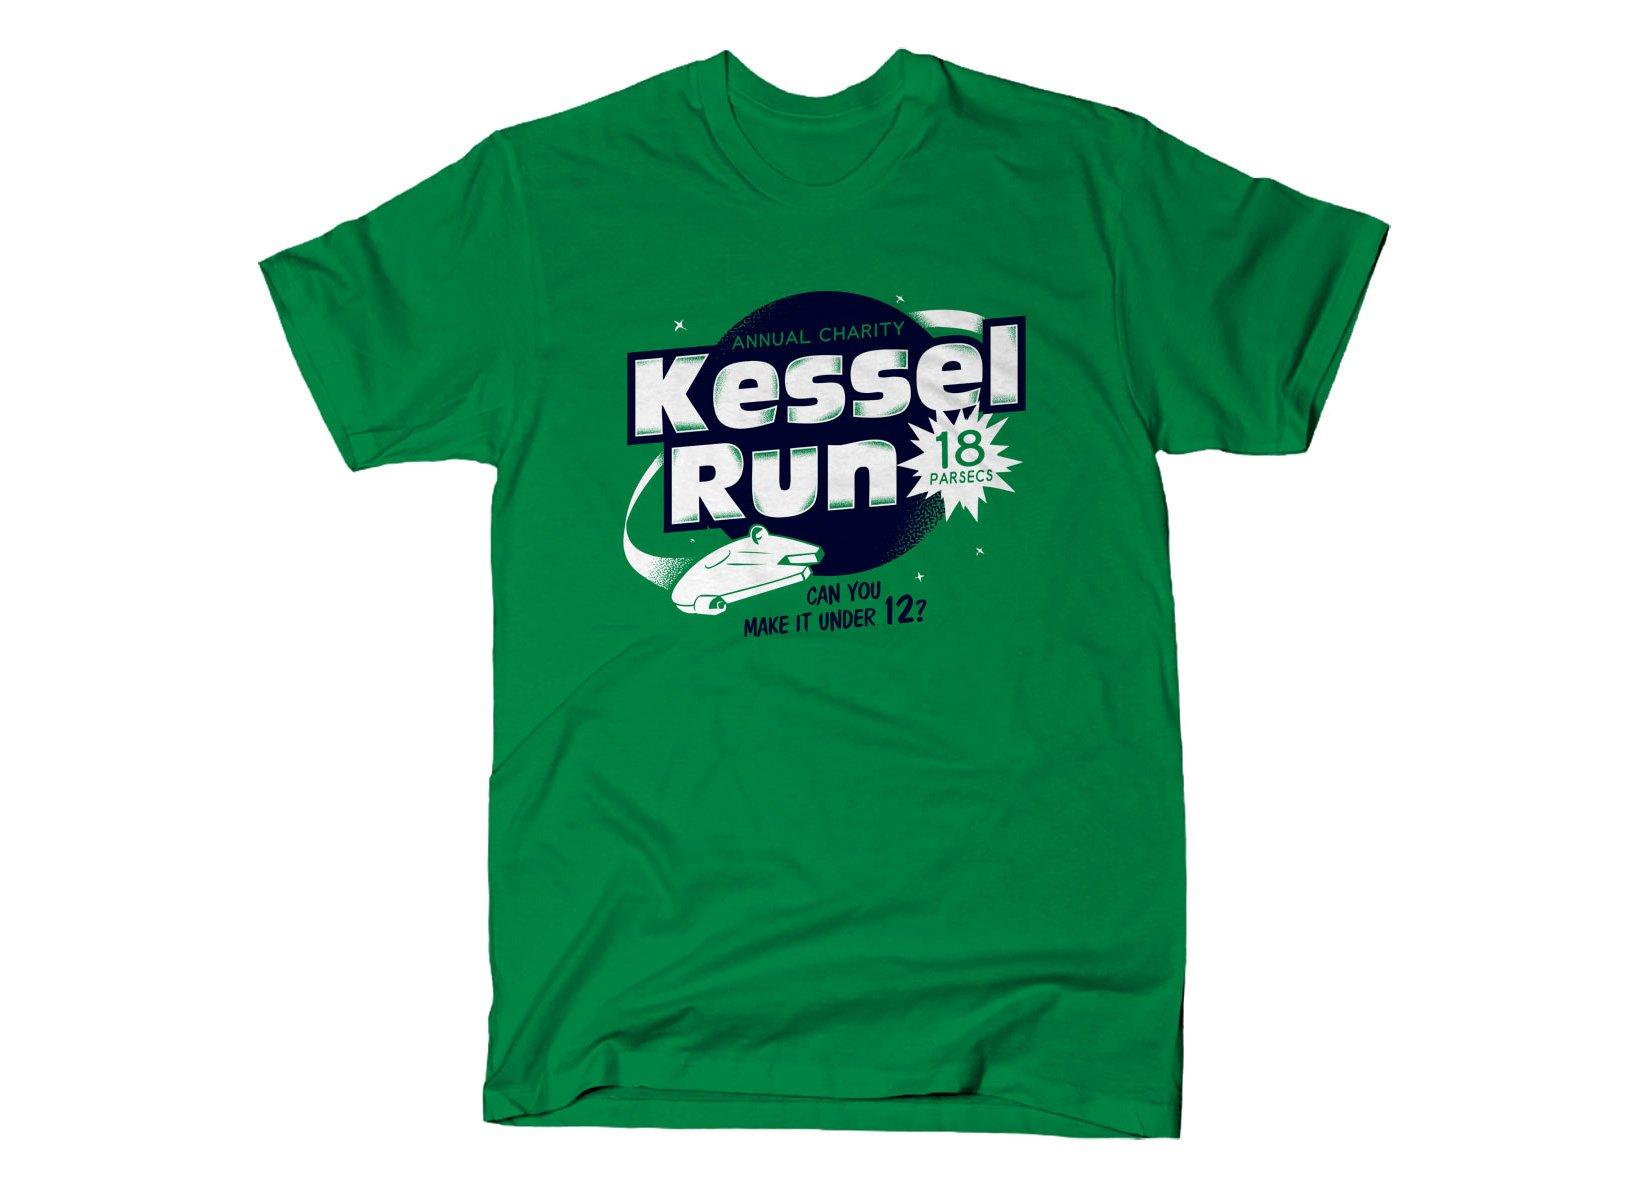 Kessel Run on Mens T-Shirt